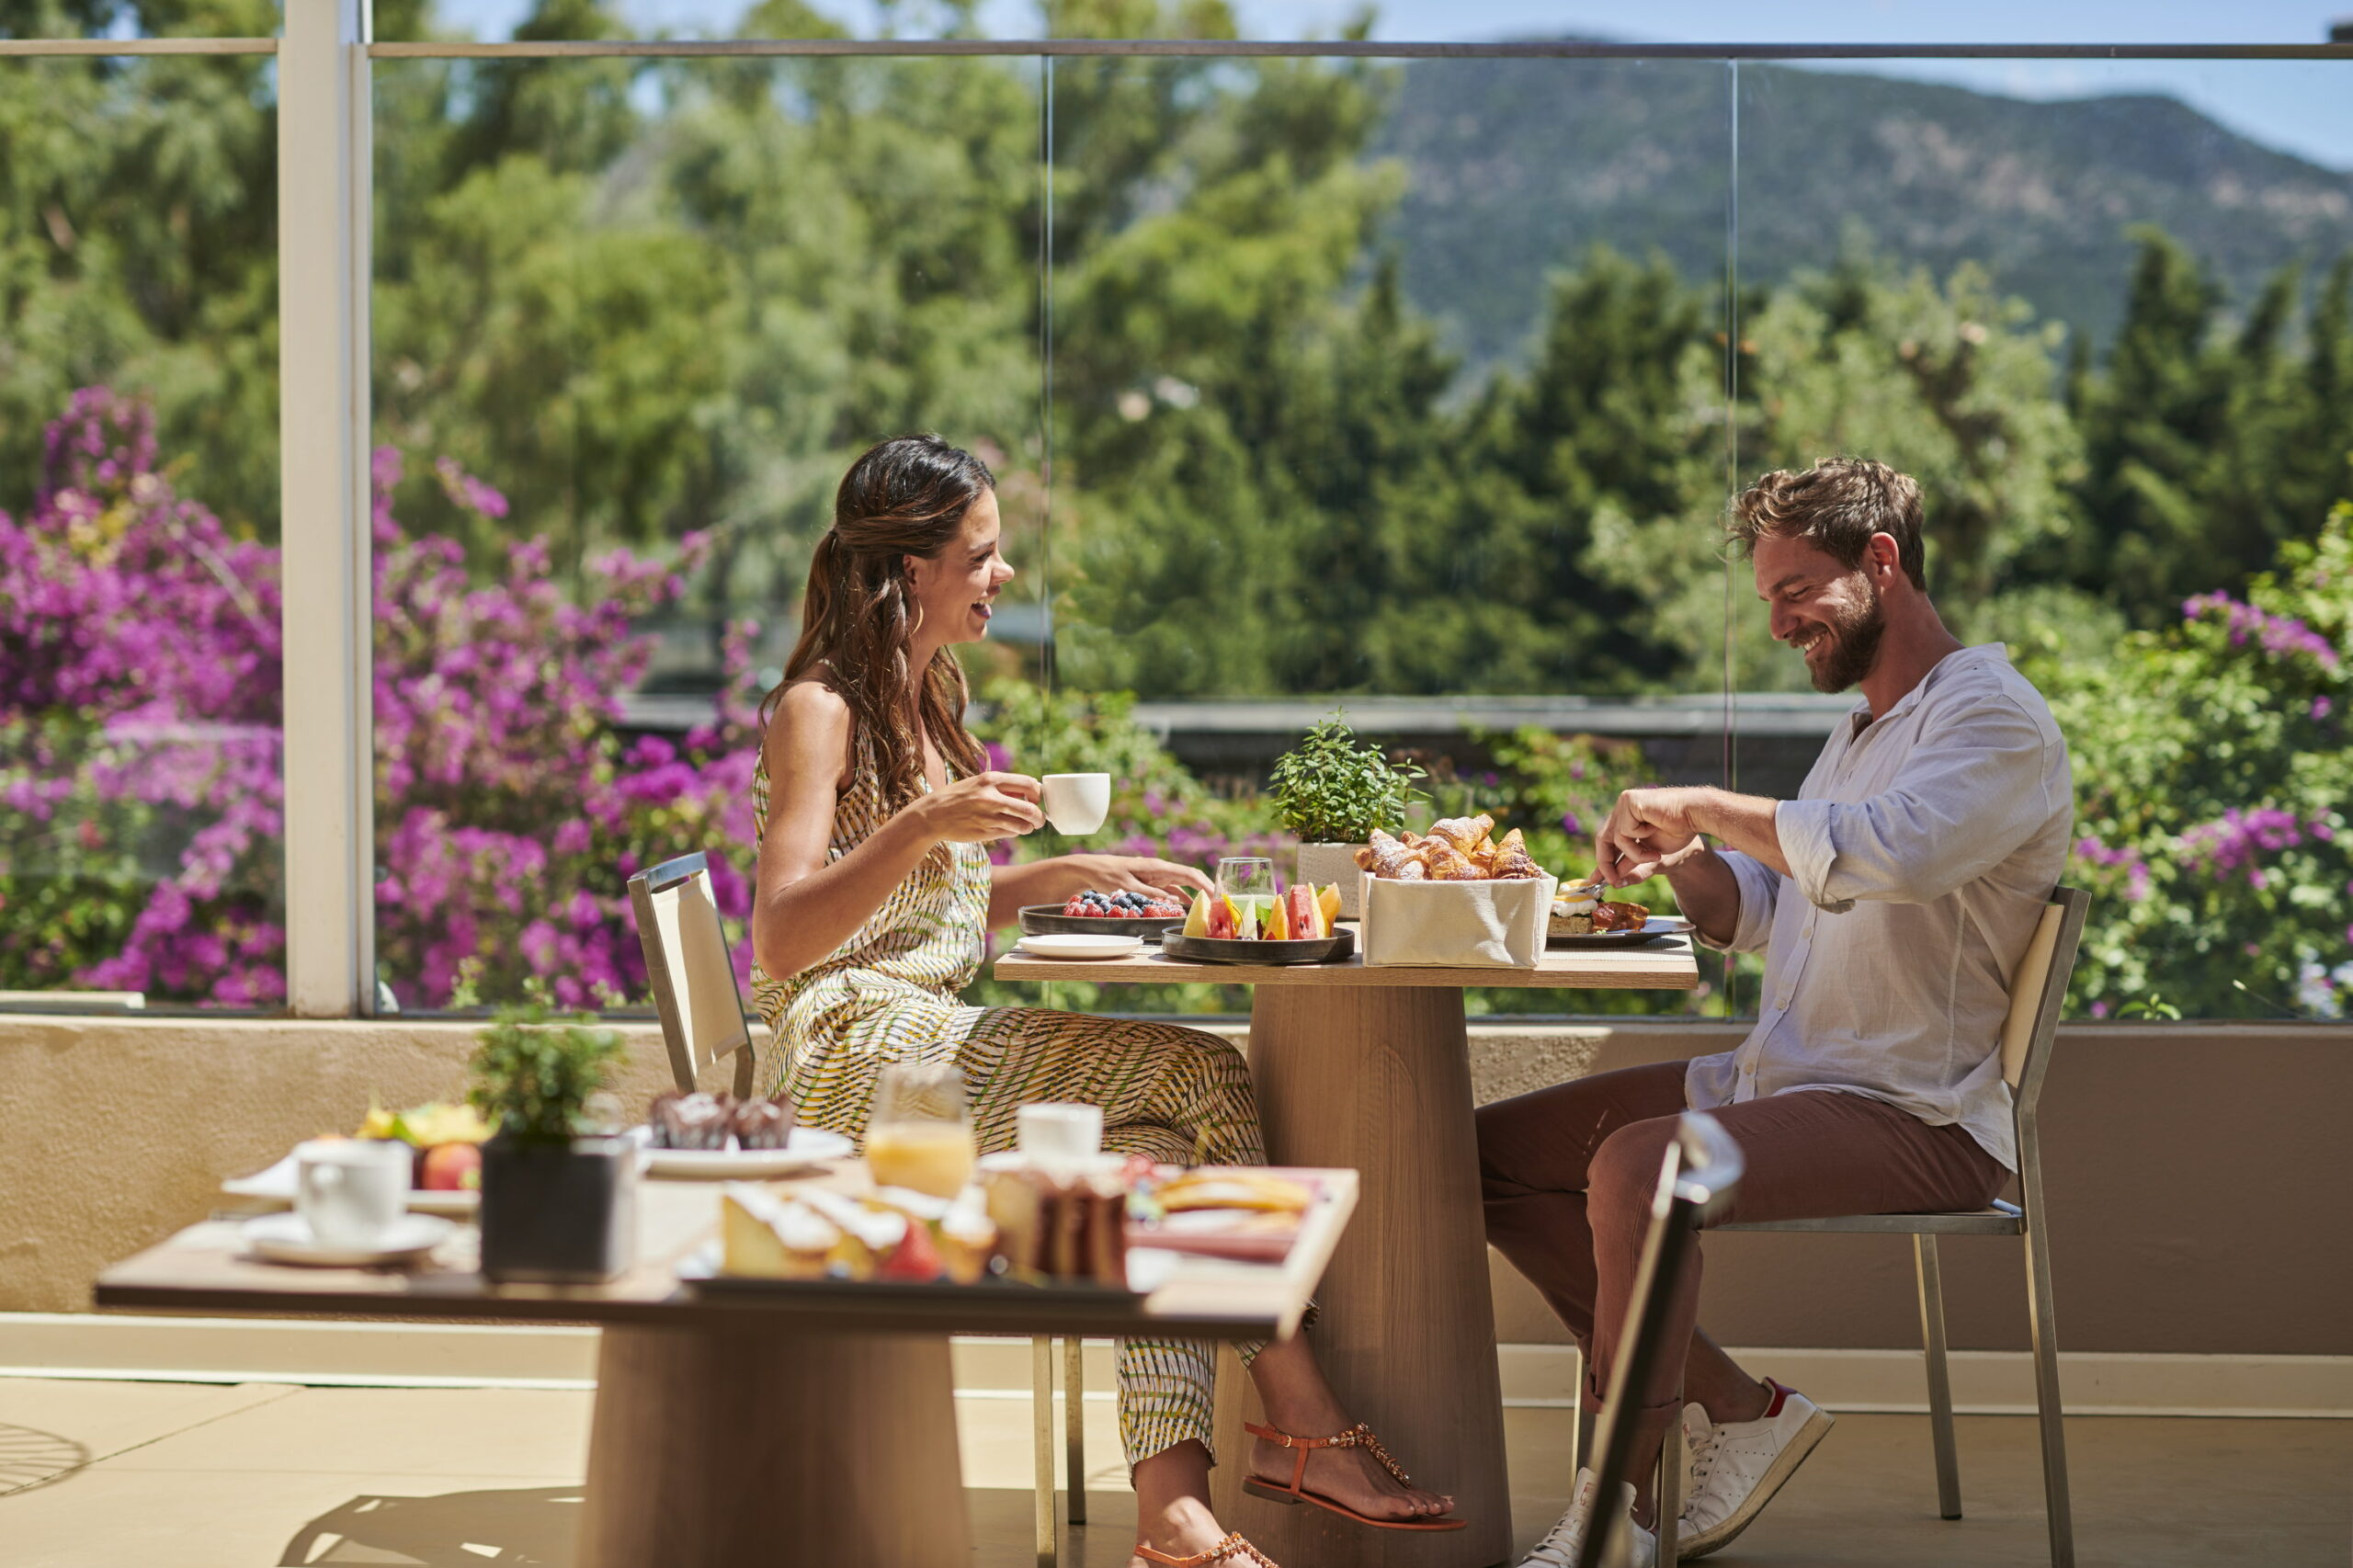 https://www.chialagunaresort.com/wp-content/uploads/2021/05/Baia-di-Chia-Resort-Sardinia_Breakfast_2-scaled.jpg